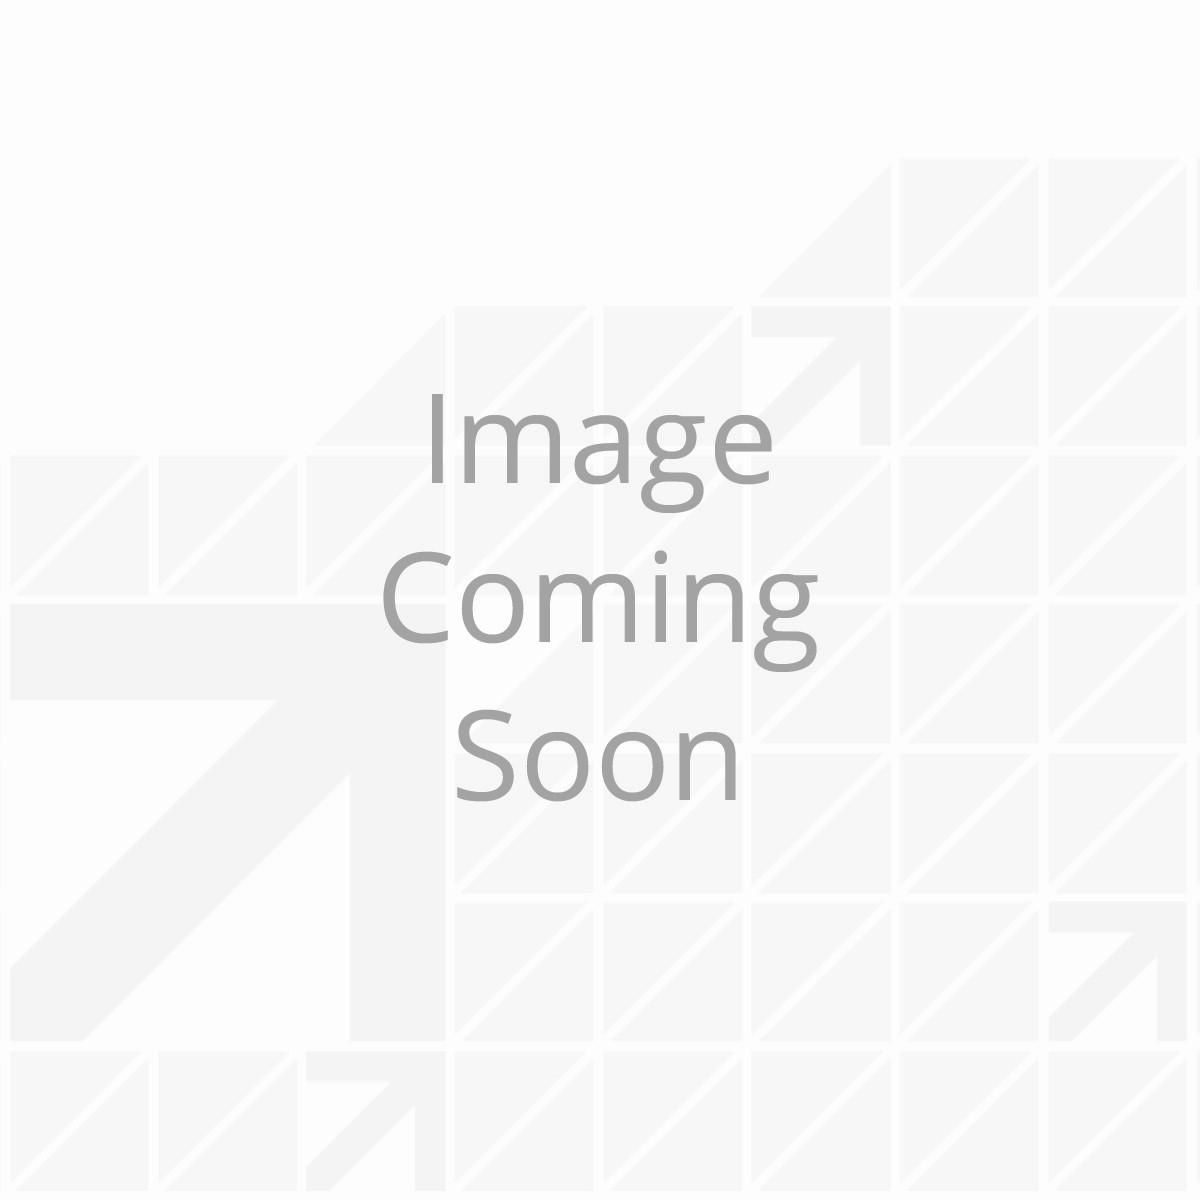 8' Awnbrella™ Fabric Support Kit - 3 Bows